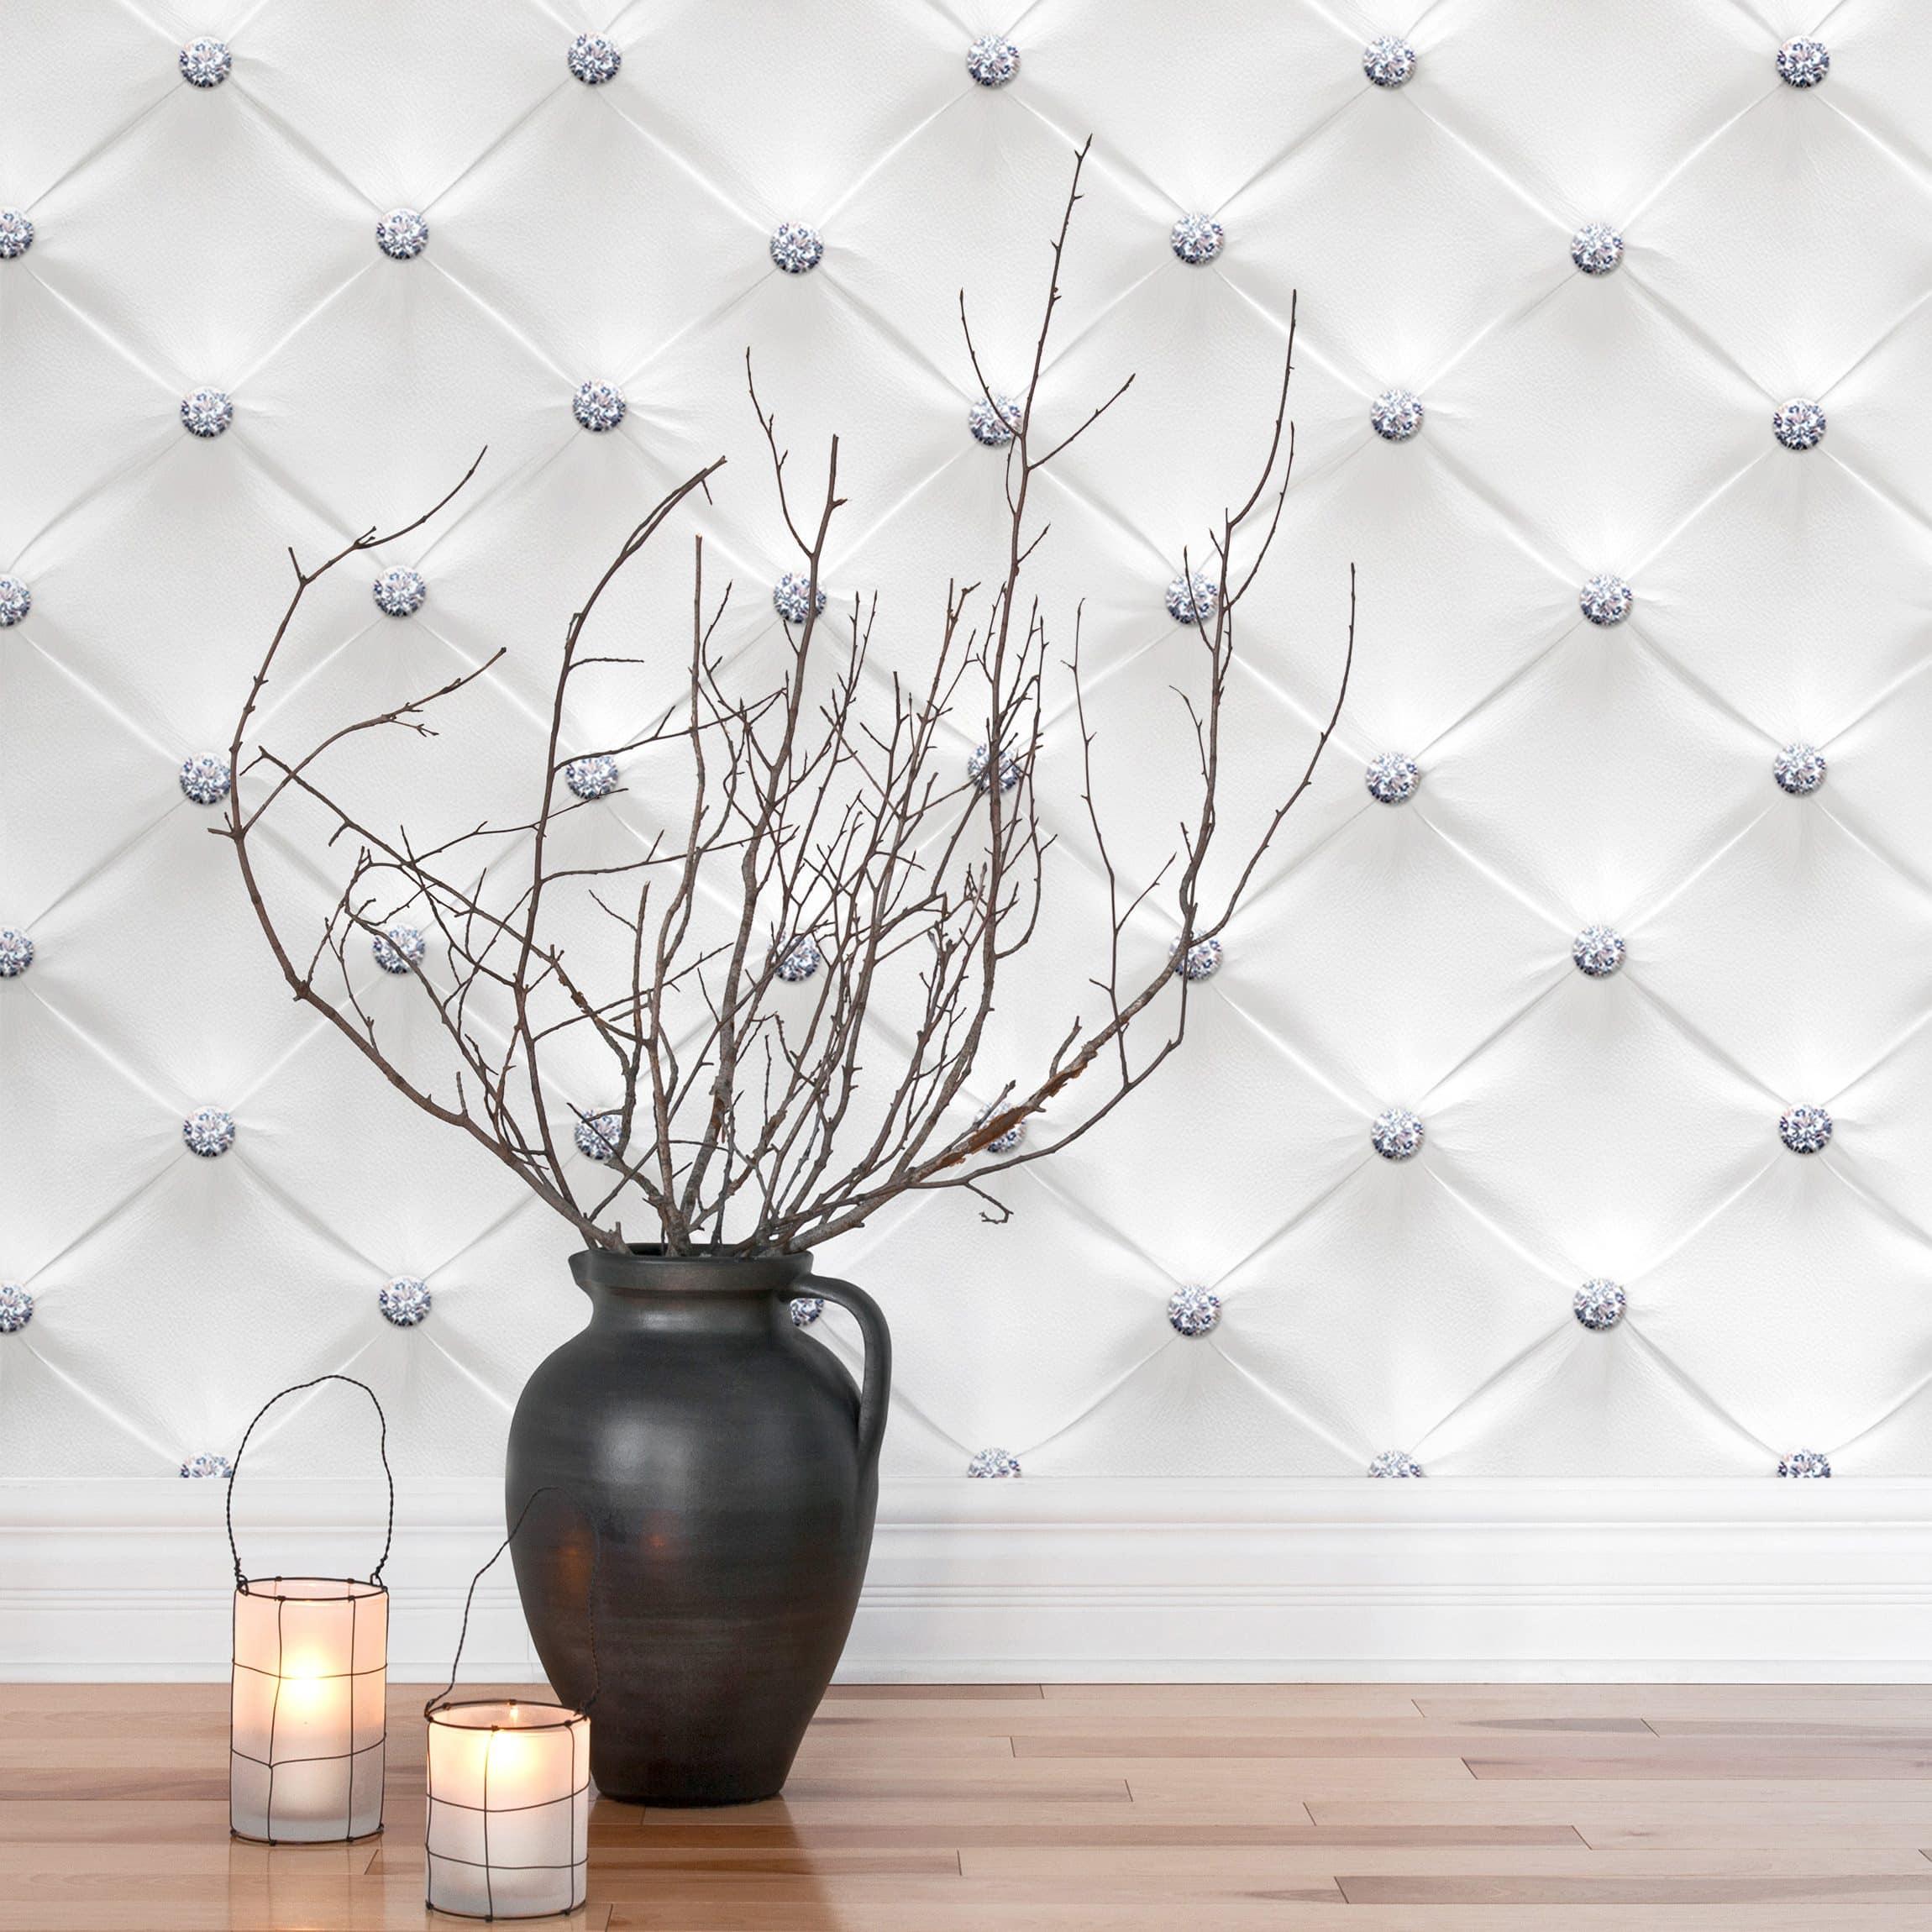 tapete selbstklebend diamant wei luxus wandbild querformat. Black Bedroom Furniture Sets. Home Design Ideas